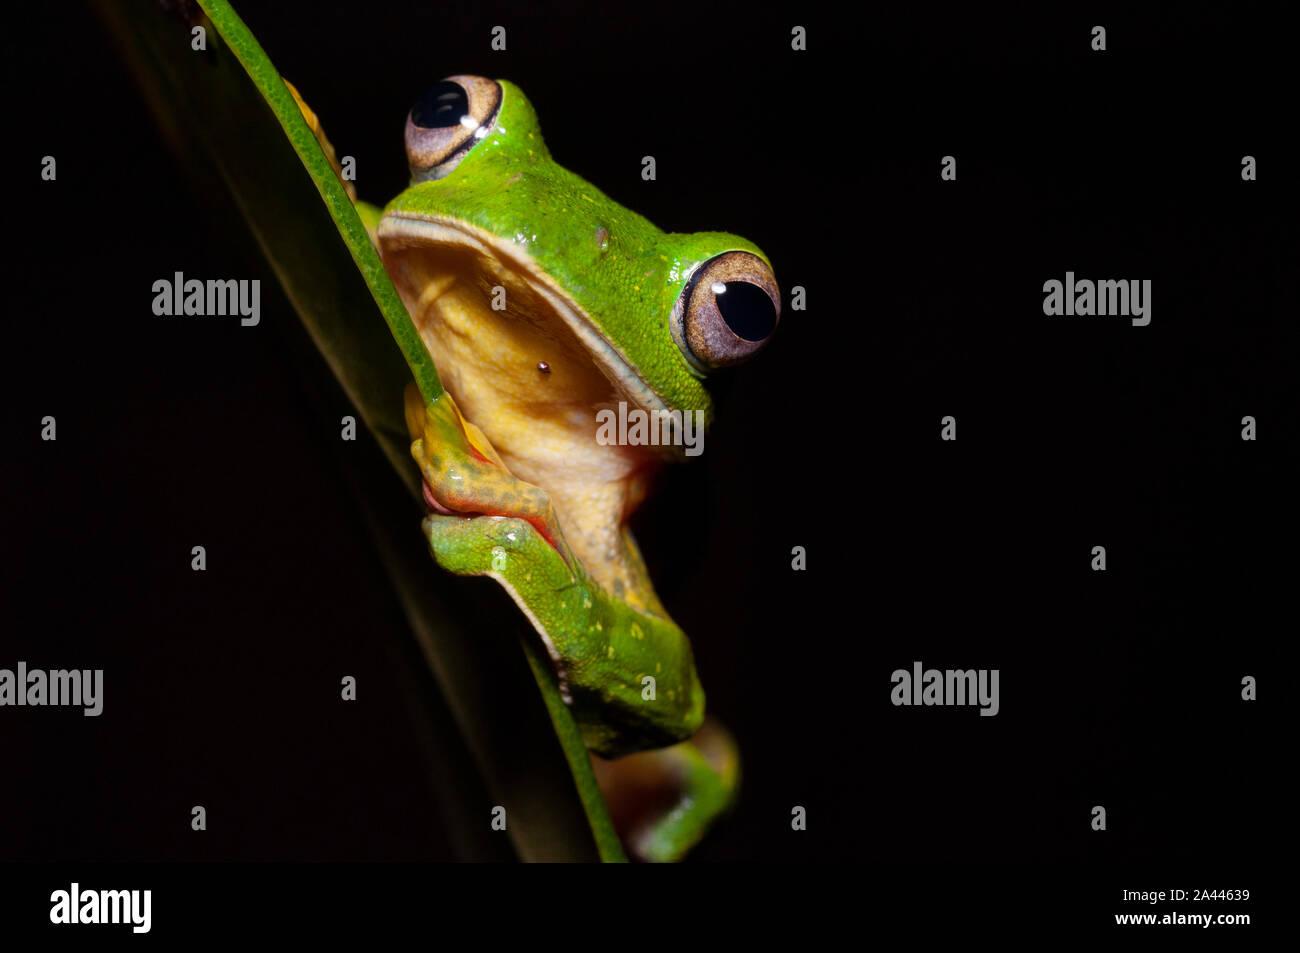 Rhacophorous Malabaricus oder Malabar Segelfliegen Frosch an Amboli, Maharashtra, Indien Stockfoto